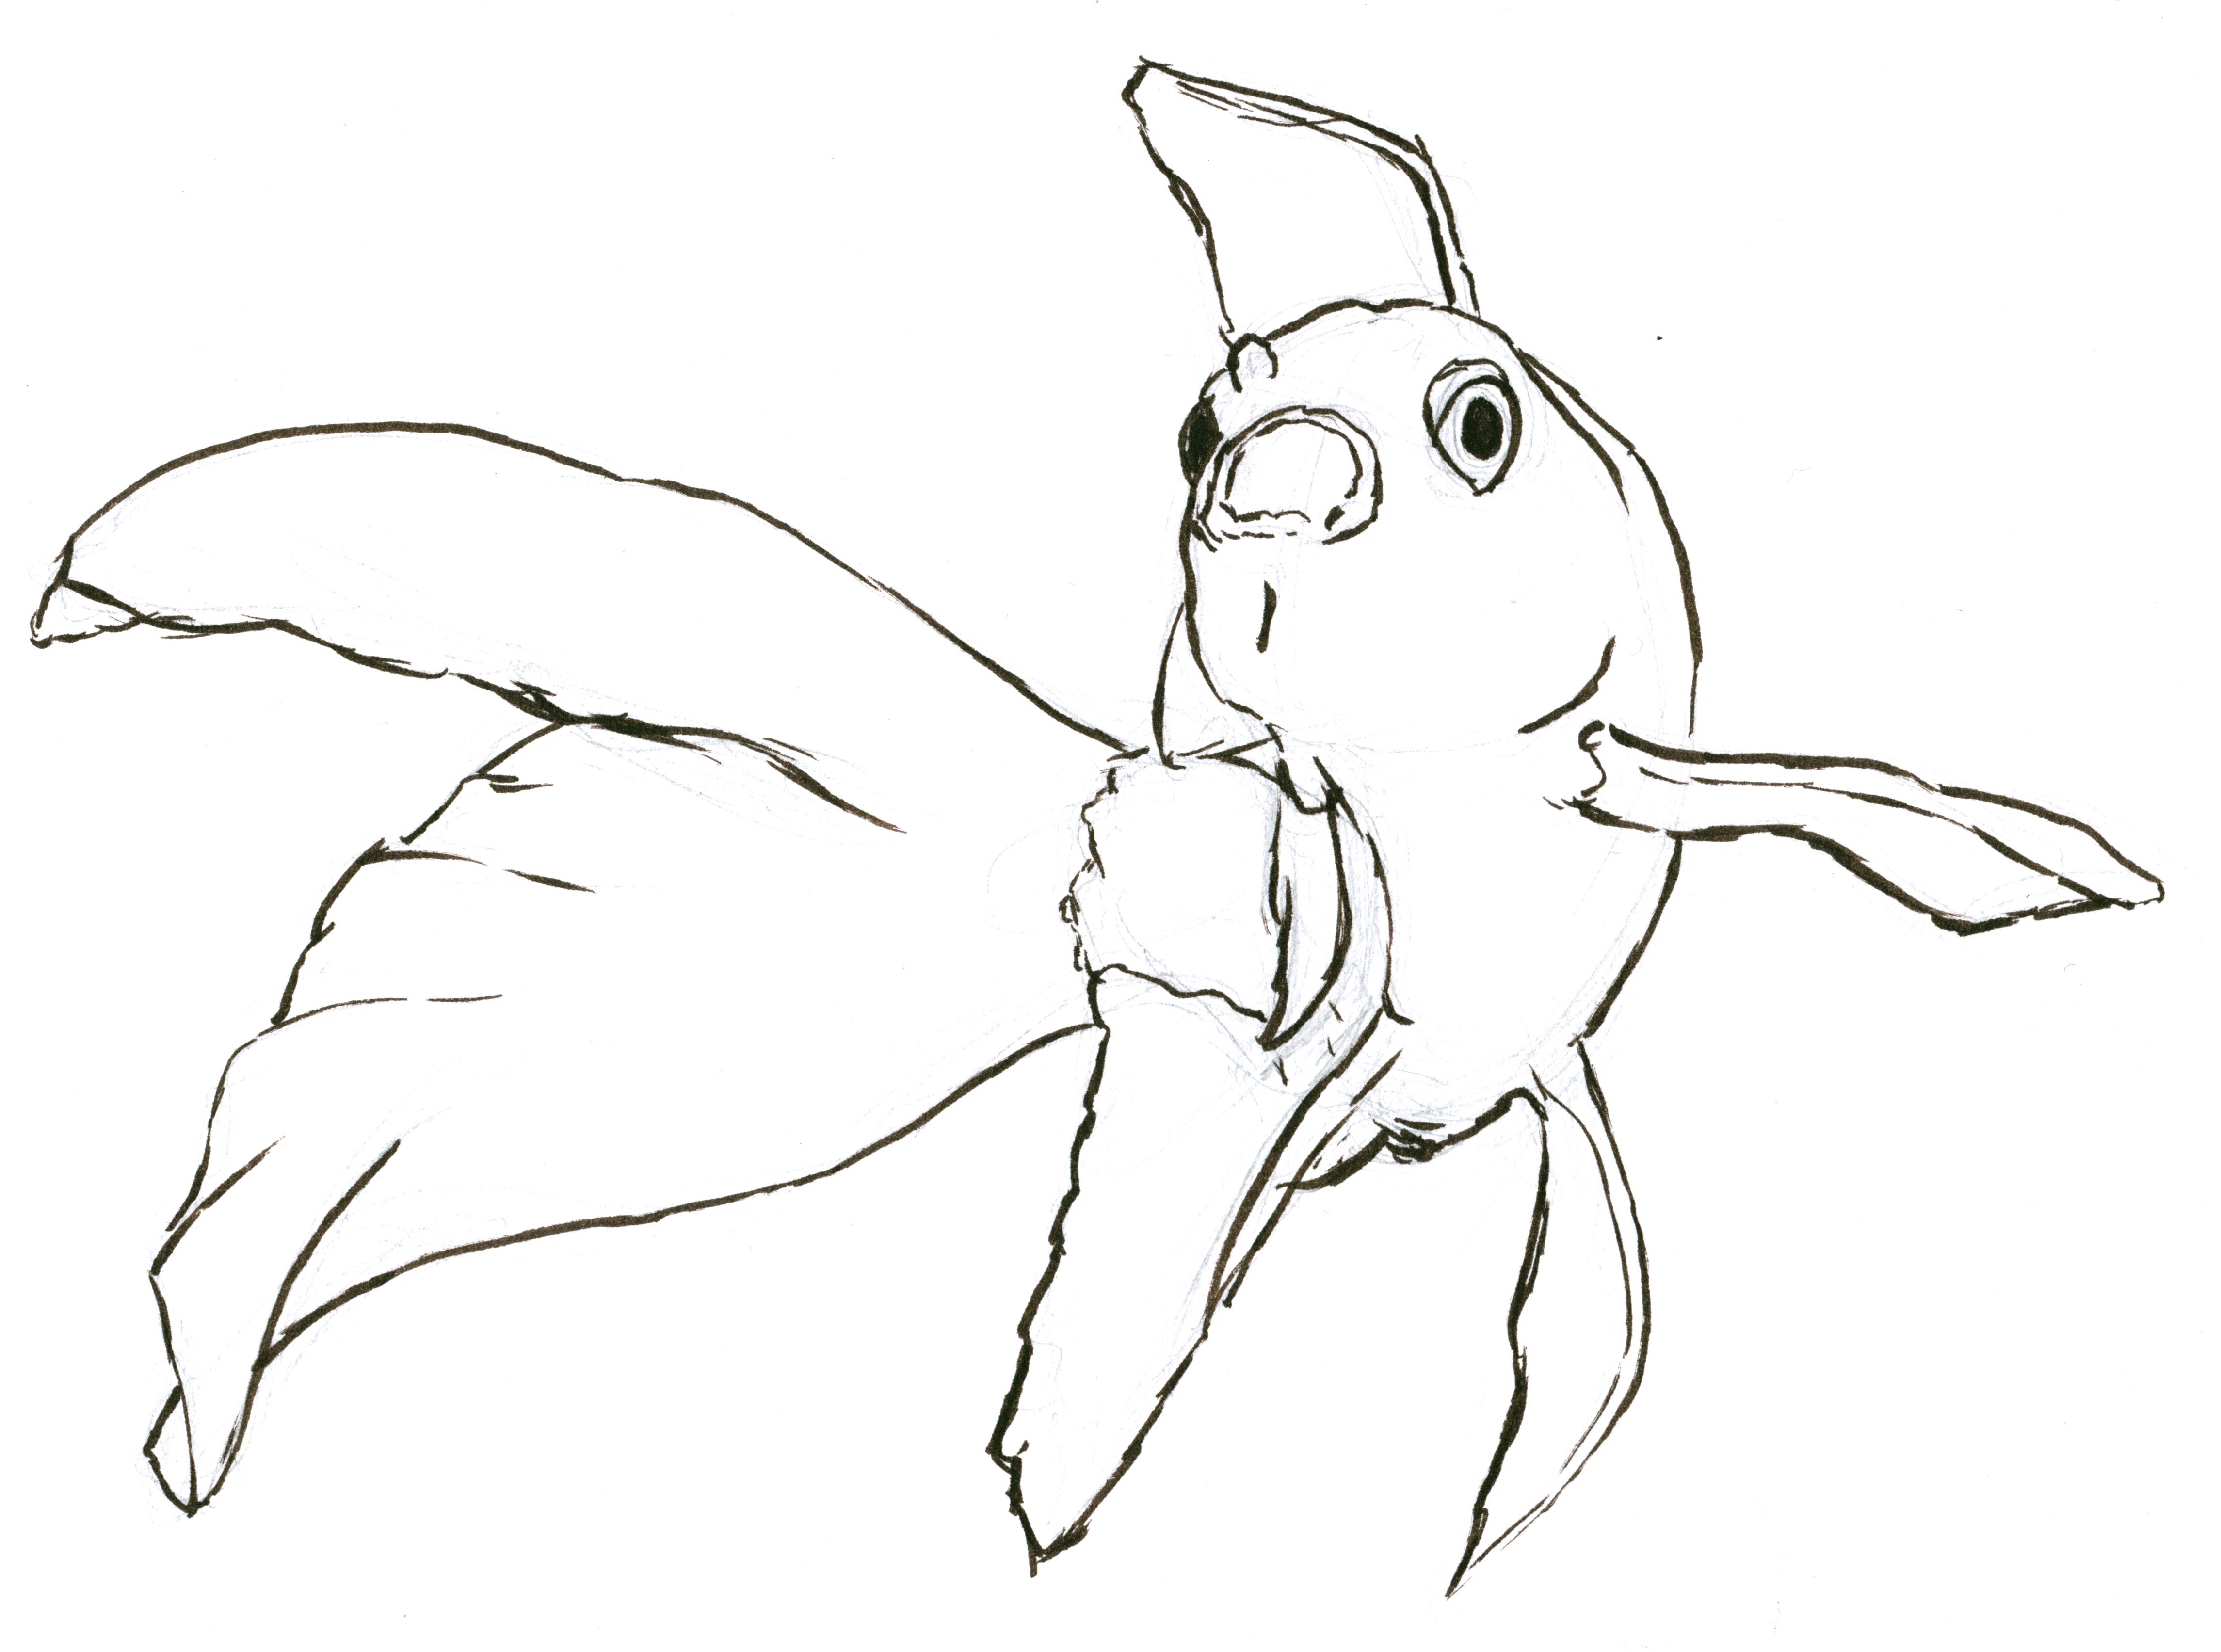 4580x3407 Weekend Inky Drawings Baby Rhino, Goldfish, Pluto Amp A Hand